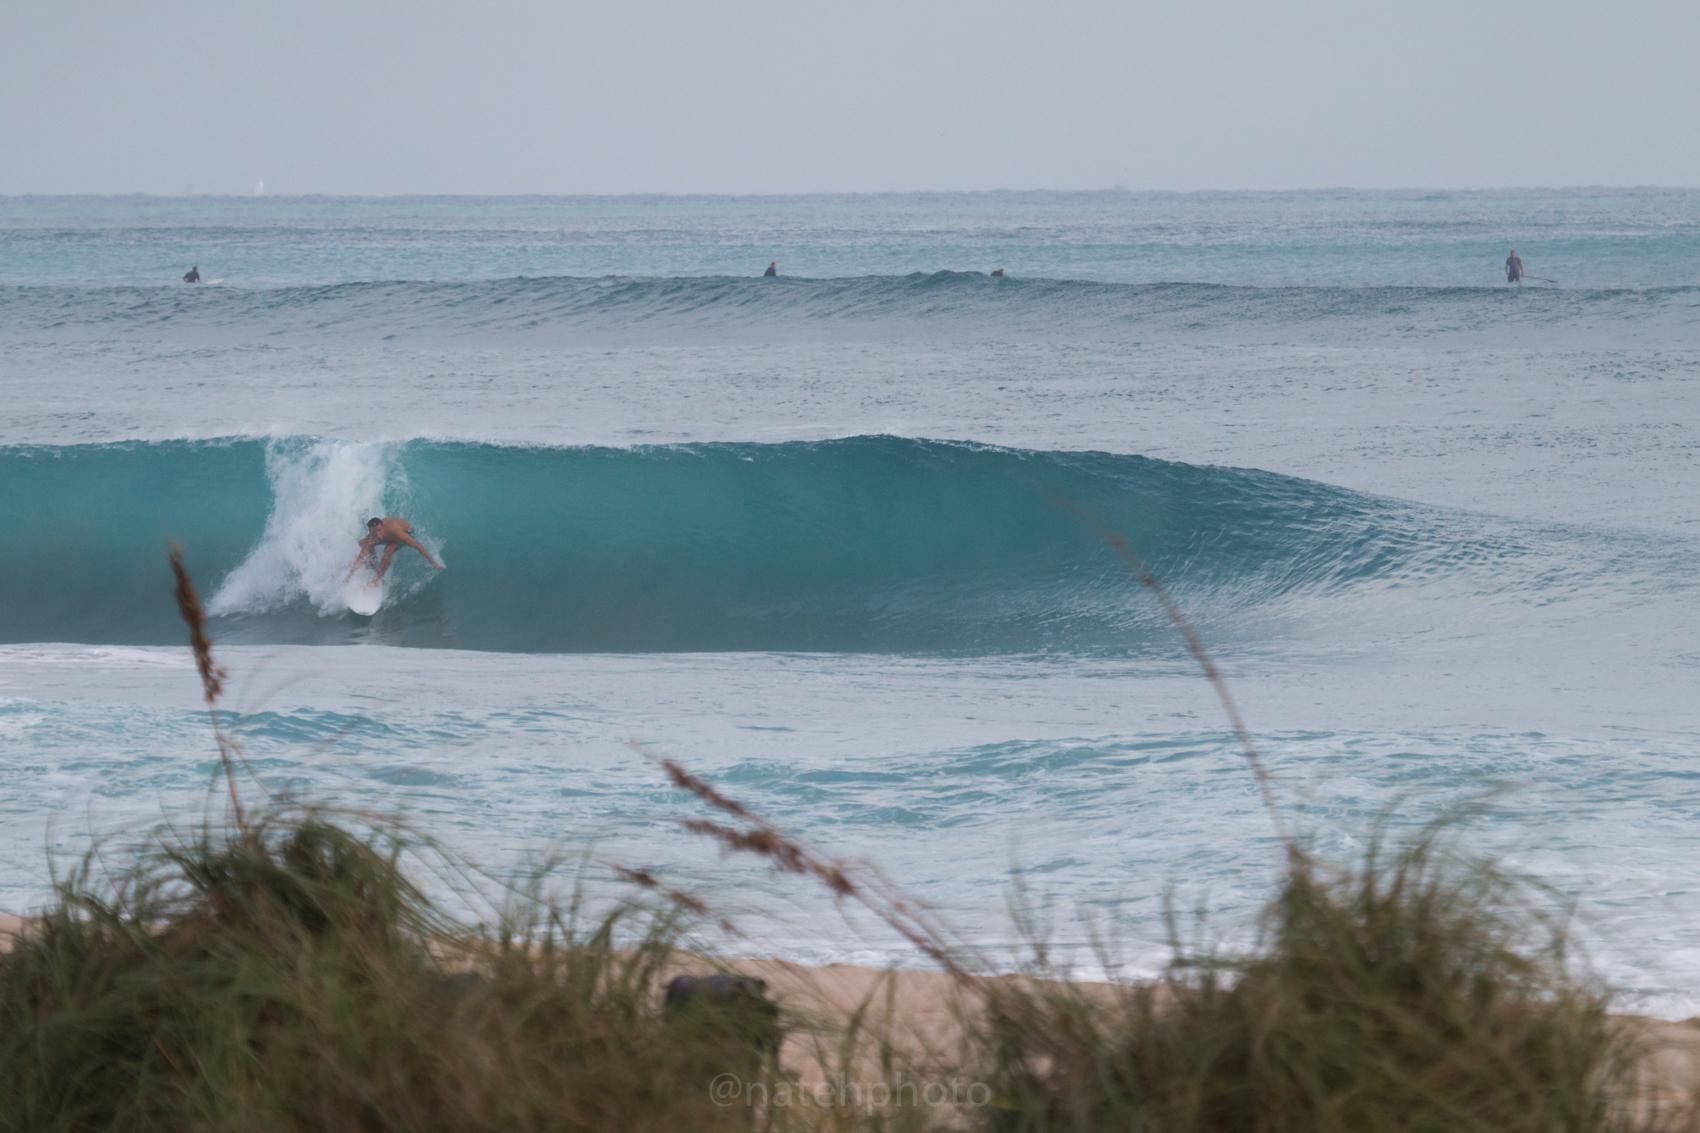 JanuarySwell_ReefRoad_Florida_natehphoto-4156.jpg